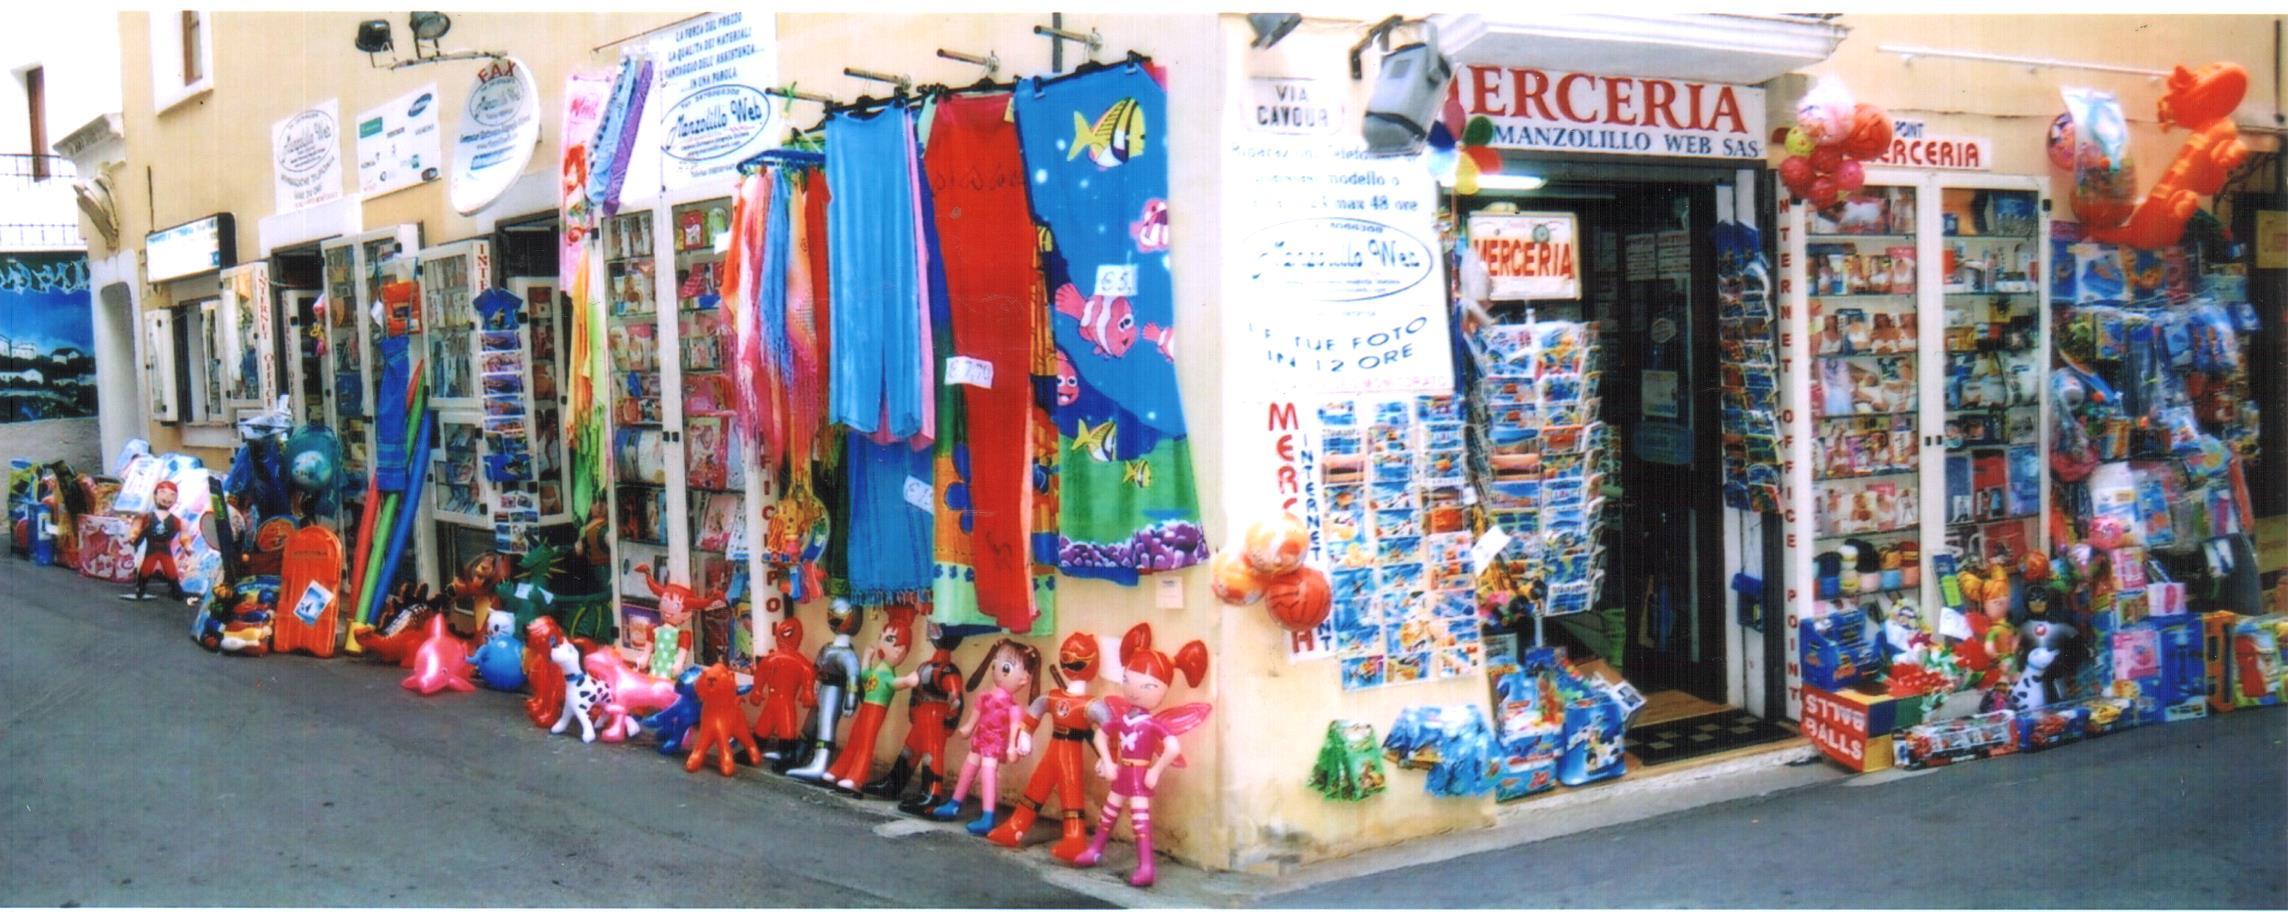 negozio 001.jpg